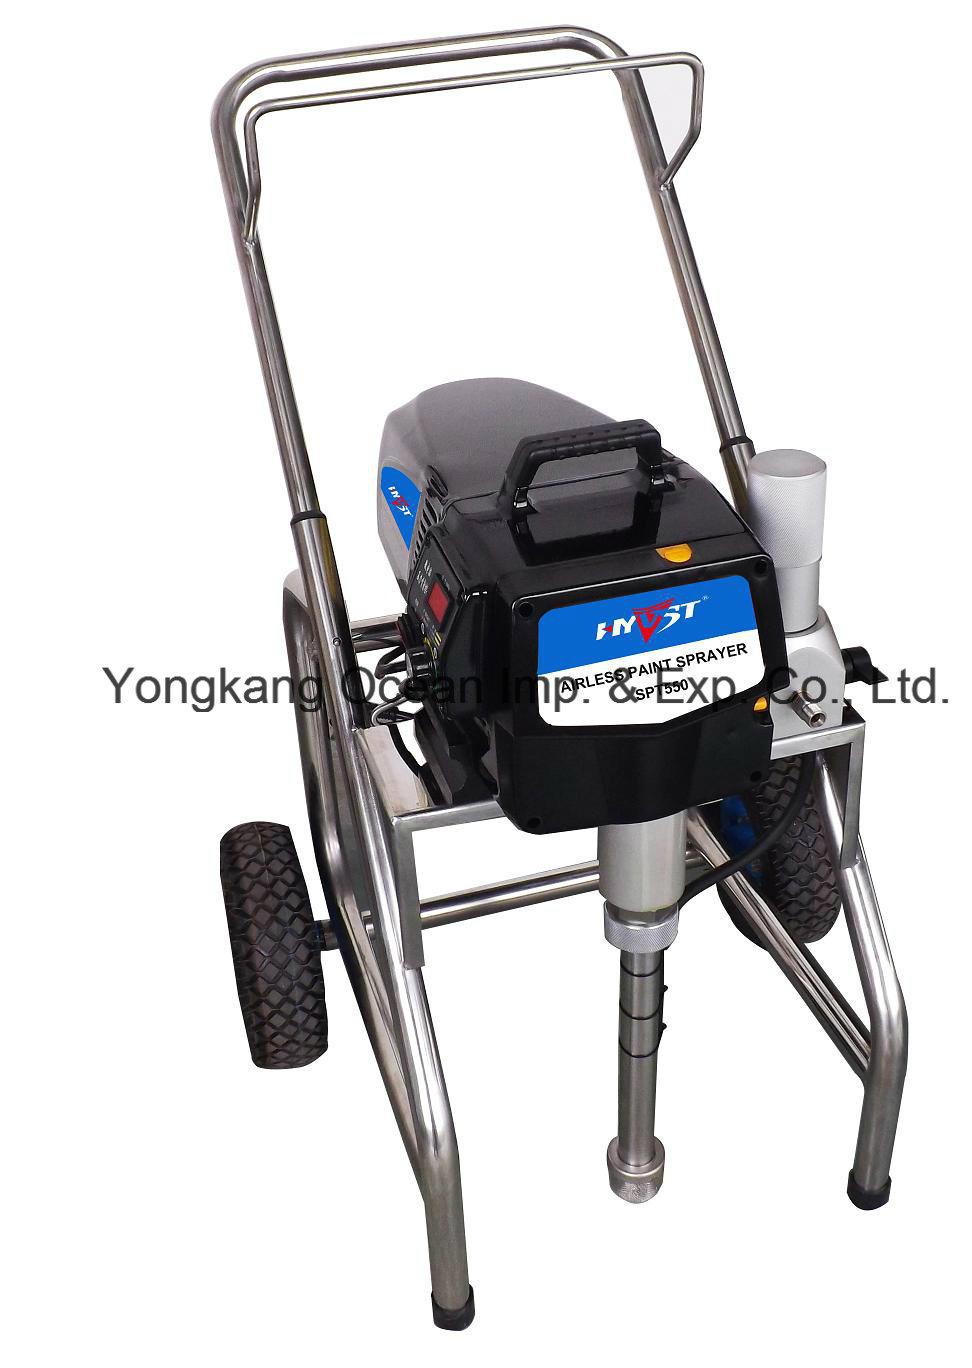 Hyvst Electric High Pressure Airless Paint Sprayer Spt550